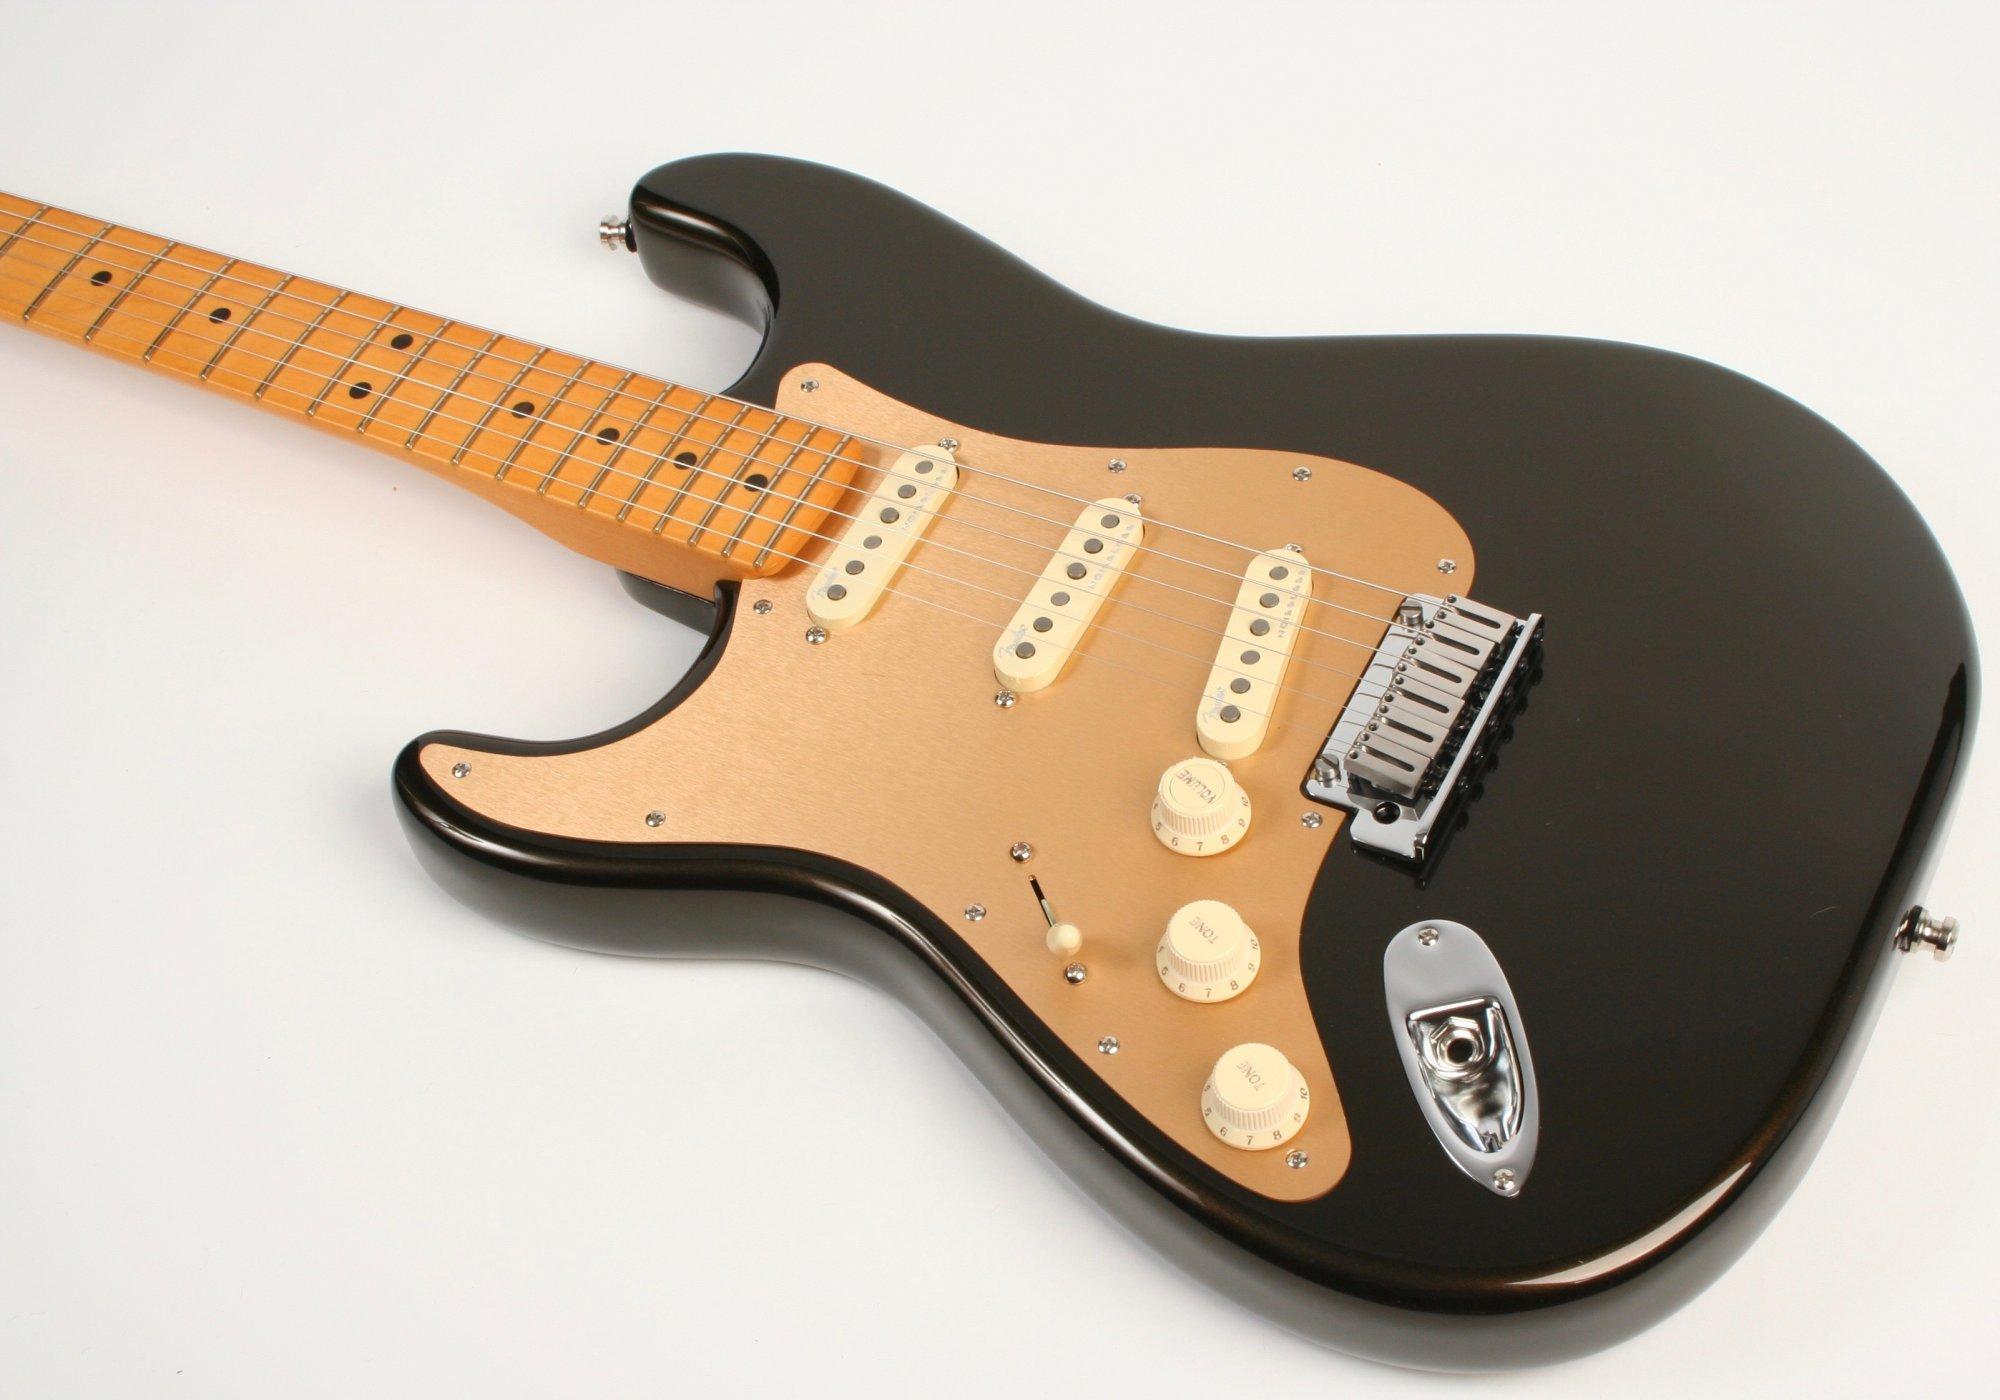 Fender American Ultra Stratocaster Left-Hand Texas Tea